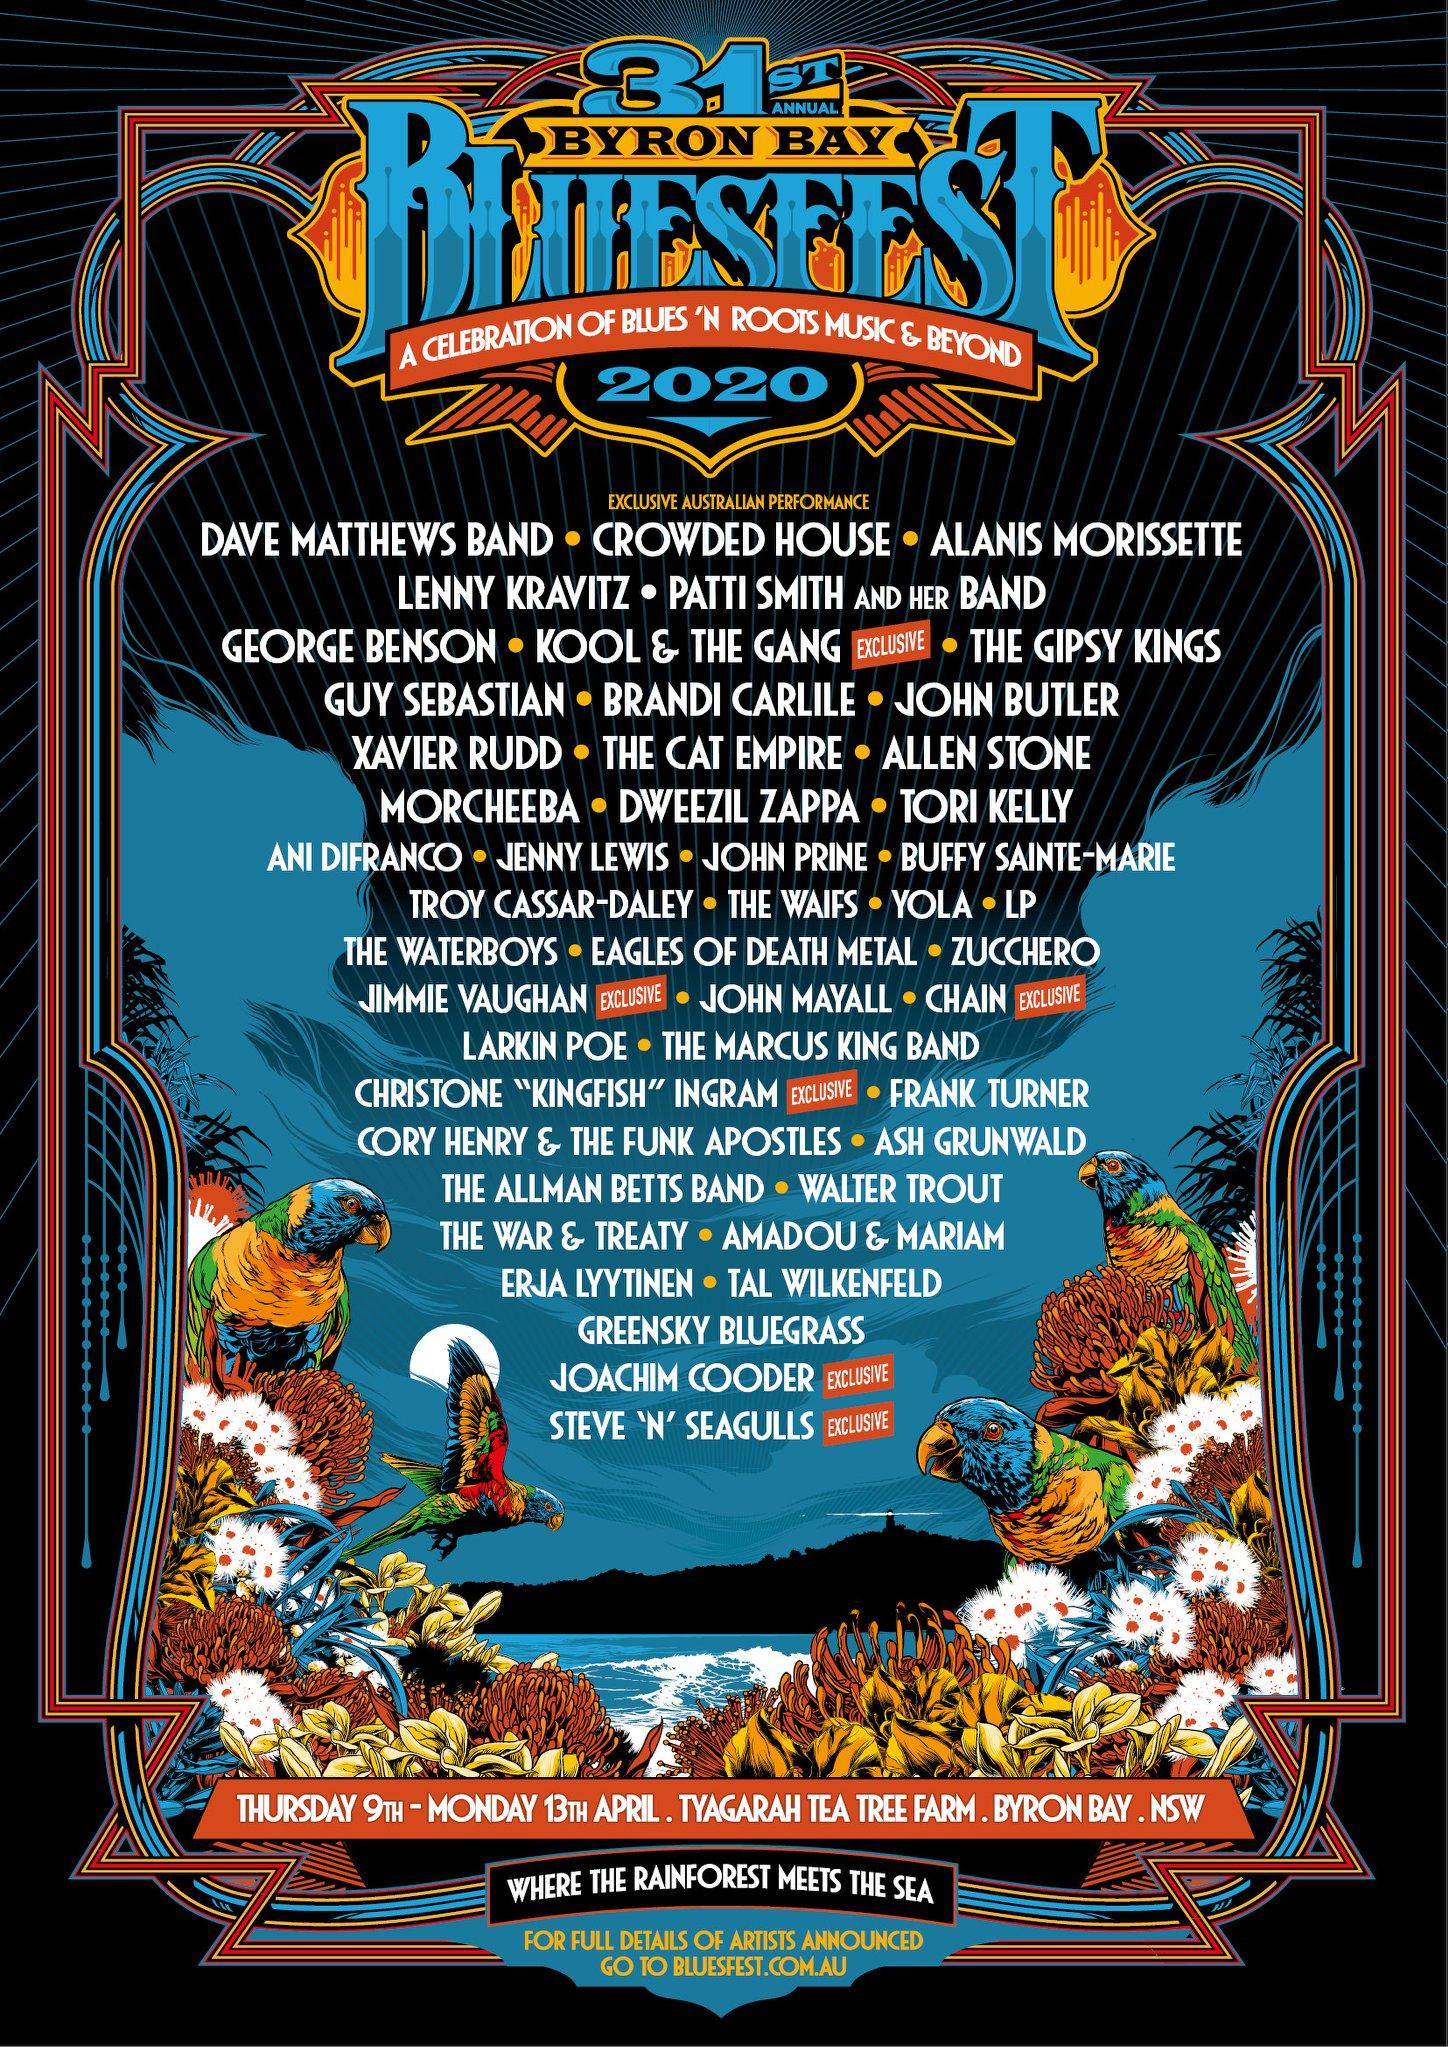 Bluesfest Byron Bay 2020 Line-Up - Australia Festivals